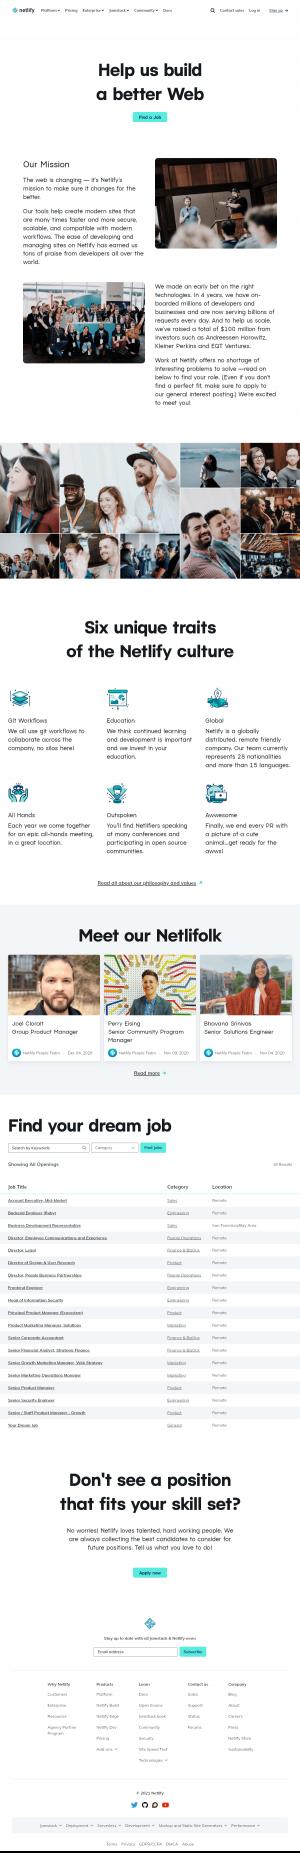 Netlify – Careers page